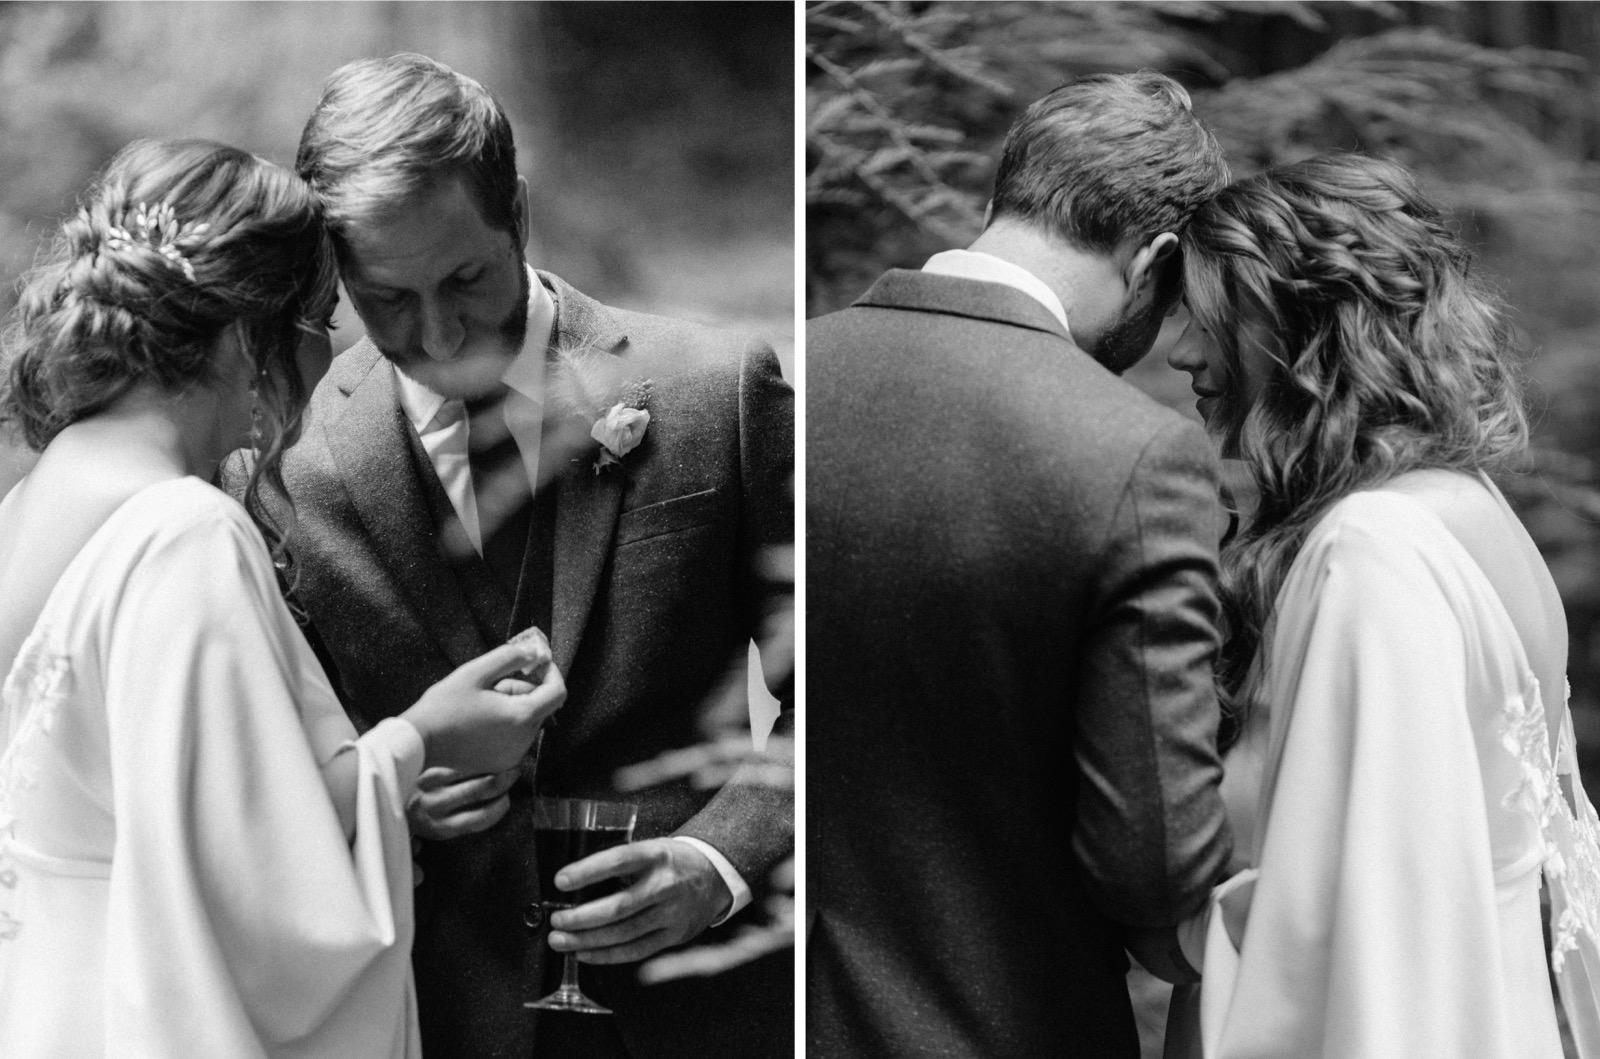 072_Emily & Jeff Wedding 0678_Emily & Jeff Wedding 0677_the-waterfall-lodge_forest_wedding_ben-lomond_intimate